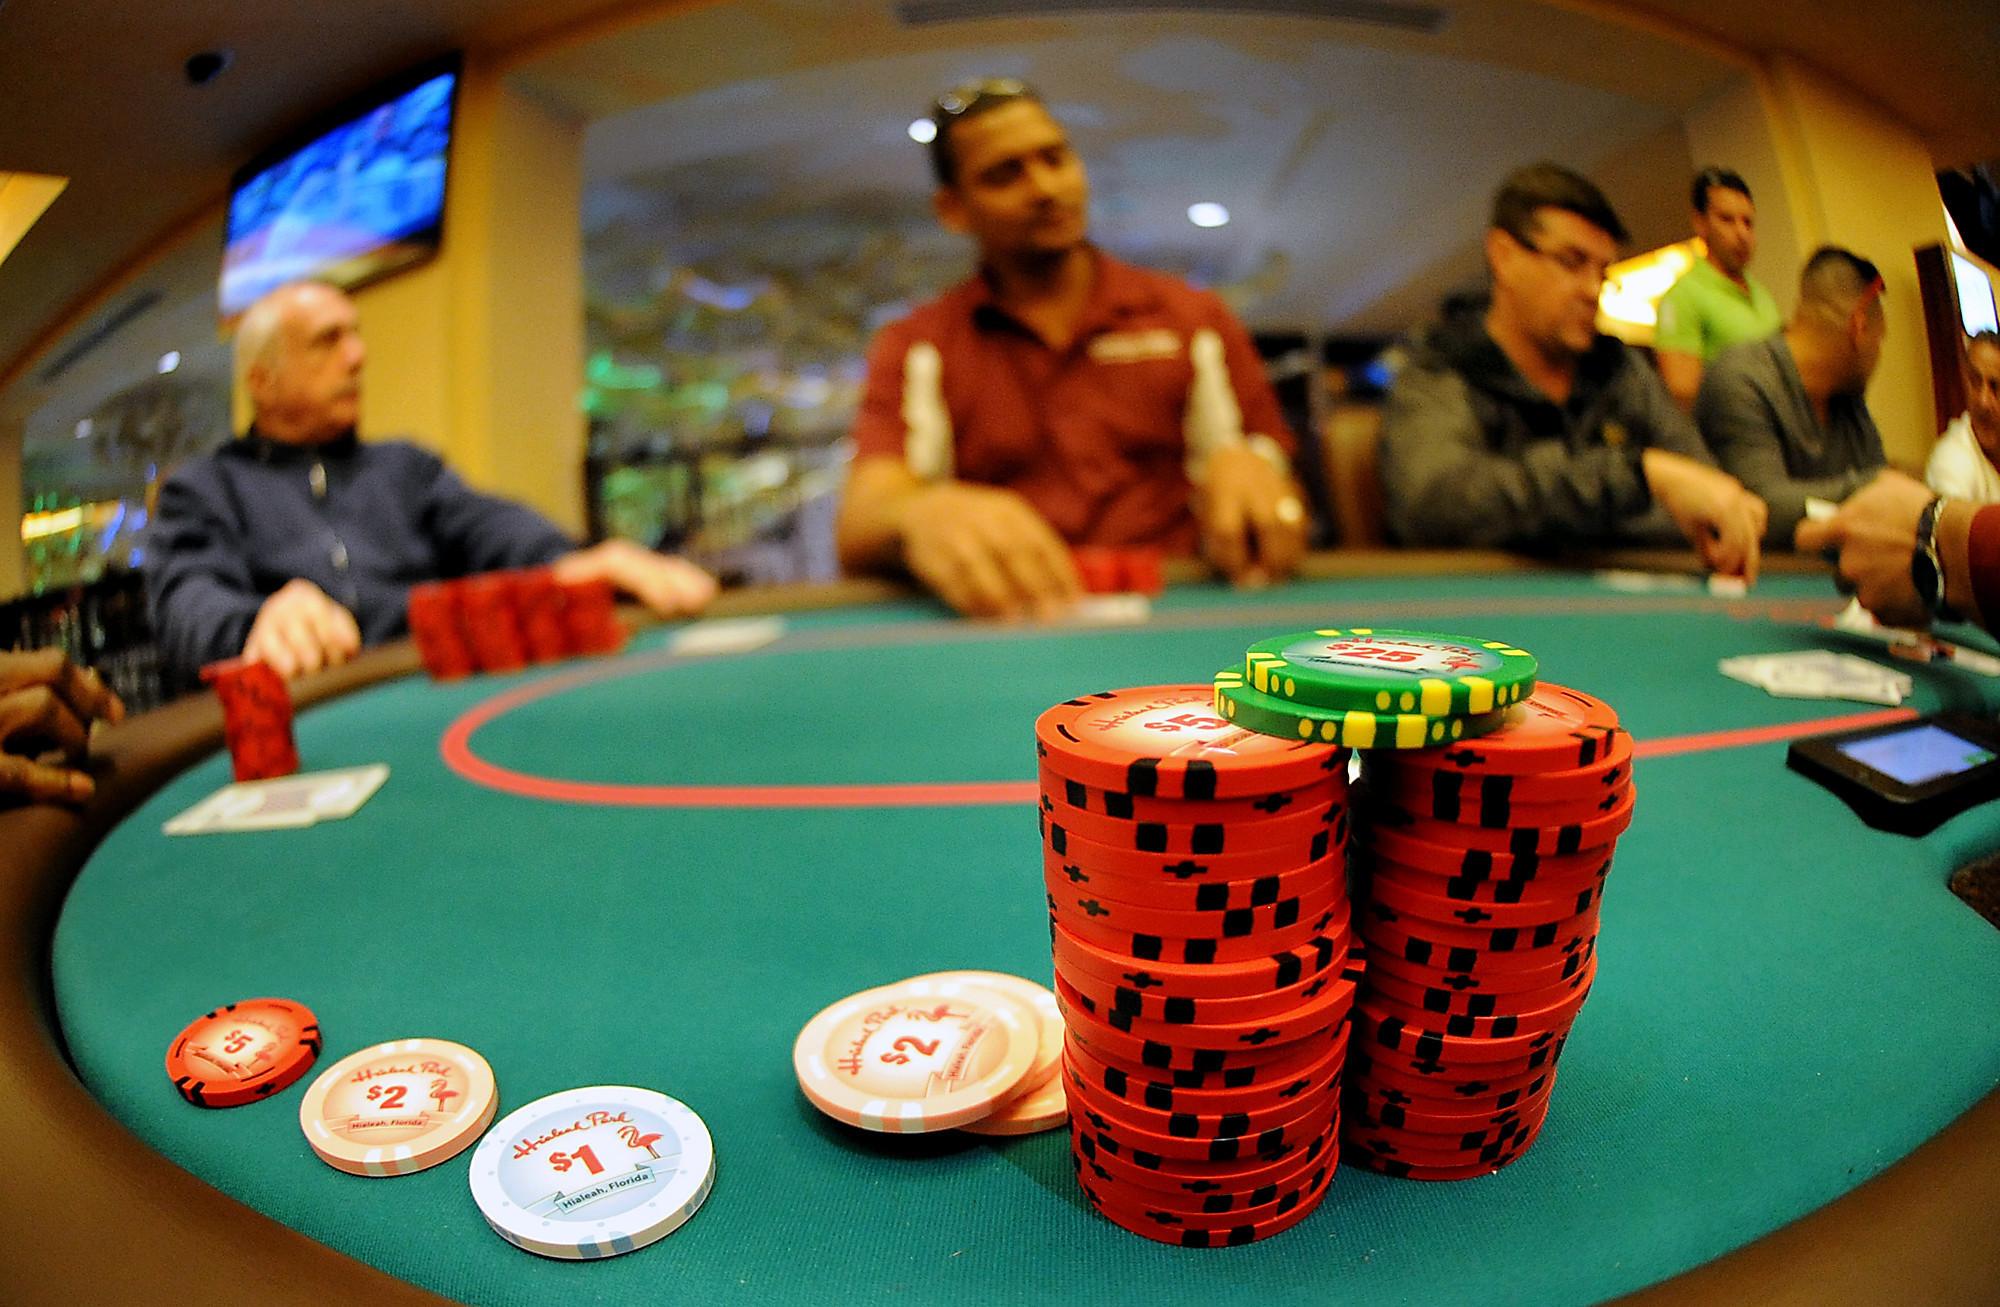 Poker dossi cisterna di latina